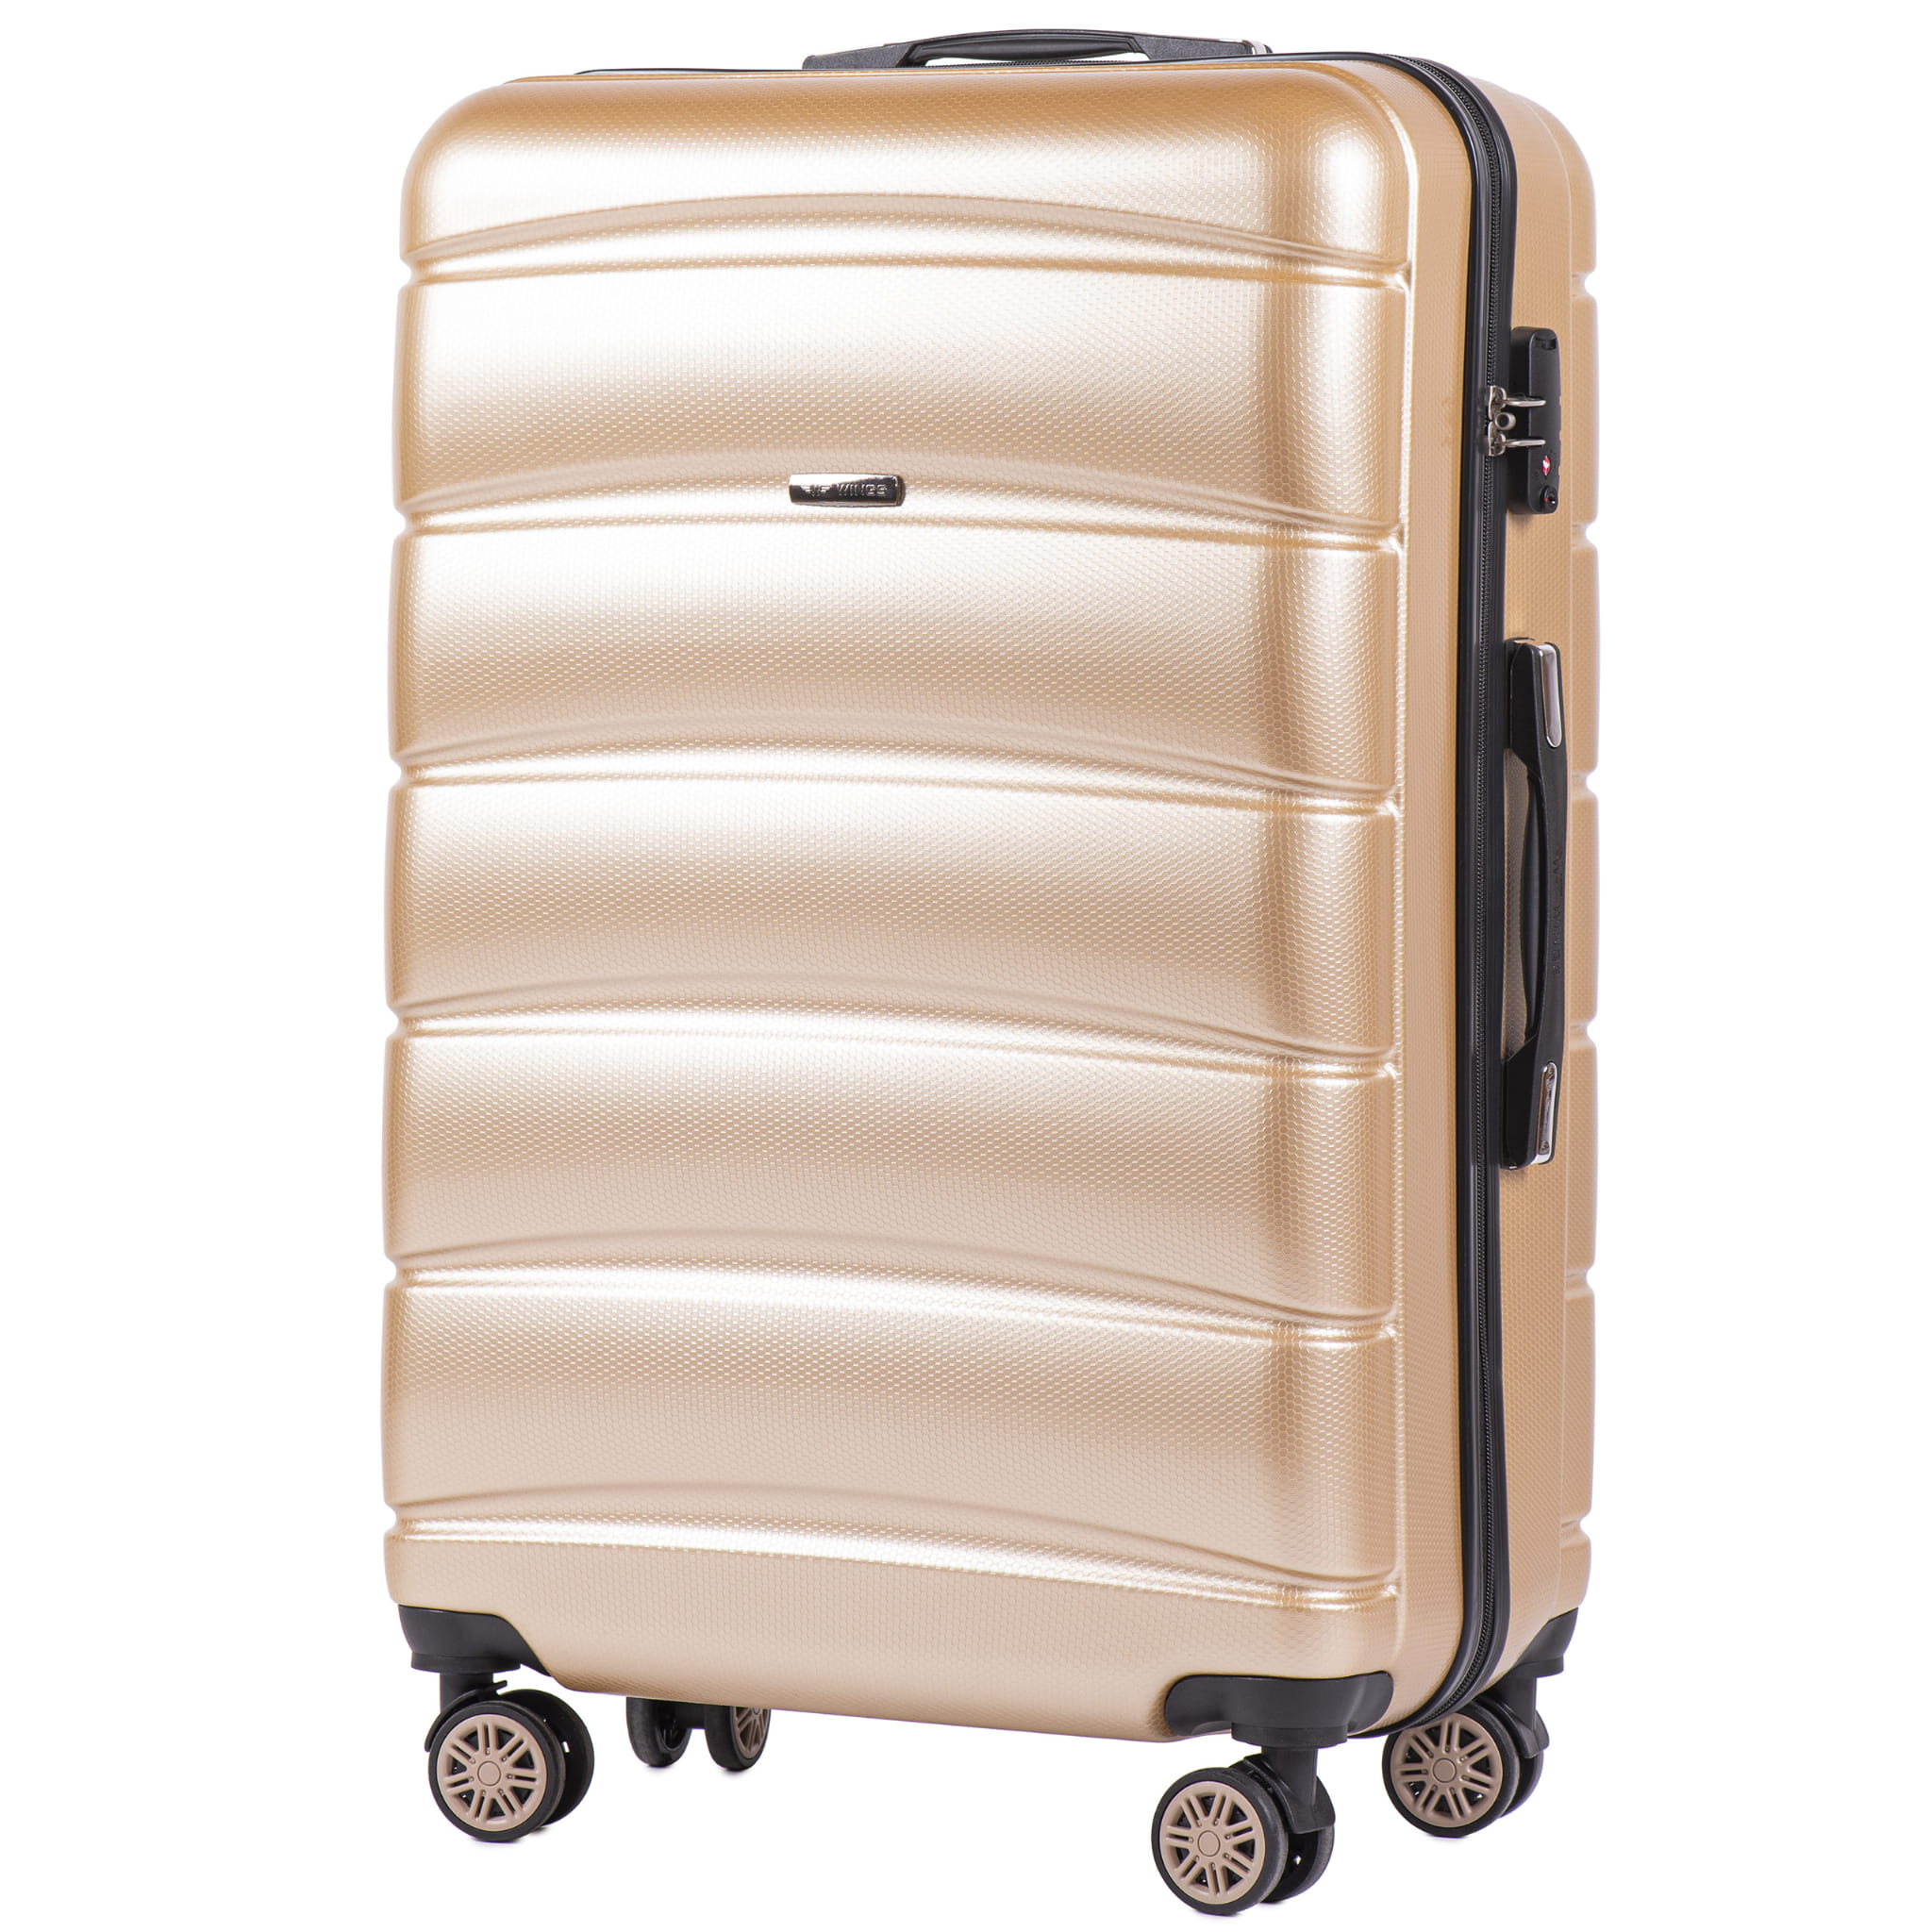 БОЛЬШОЙ ЧЕМОДАН WINGS 160 L CHAMPANGE  PREMIUM НА 4-Х КАУЧУКОВЫХ КОЛЕСАХ! Для багажа ,до 23 кг!